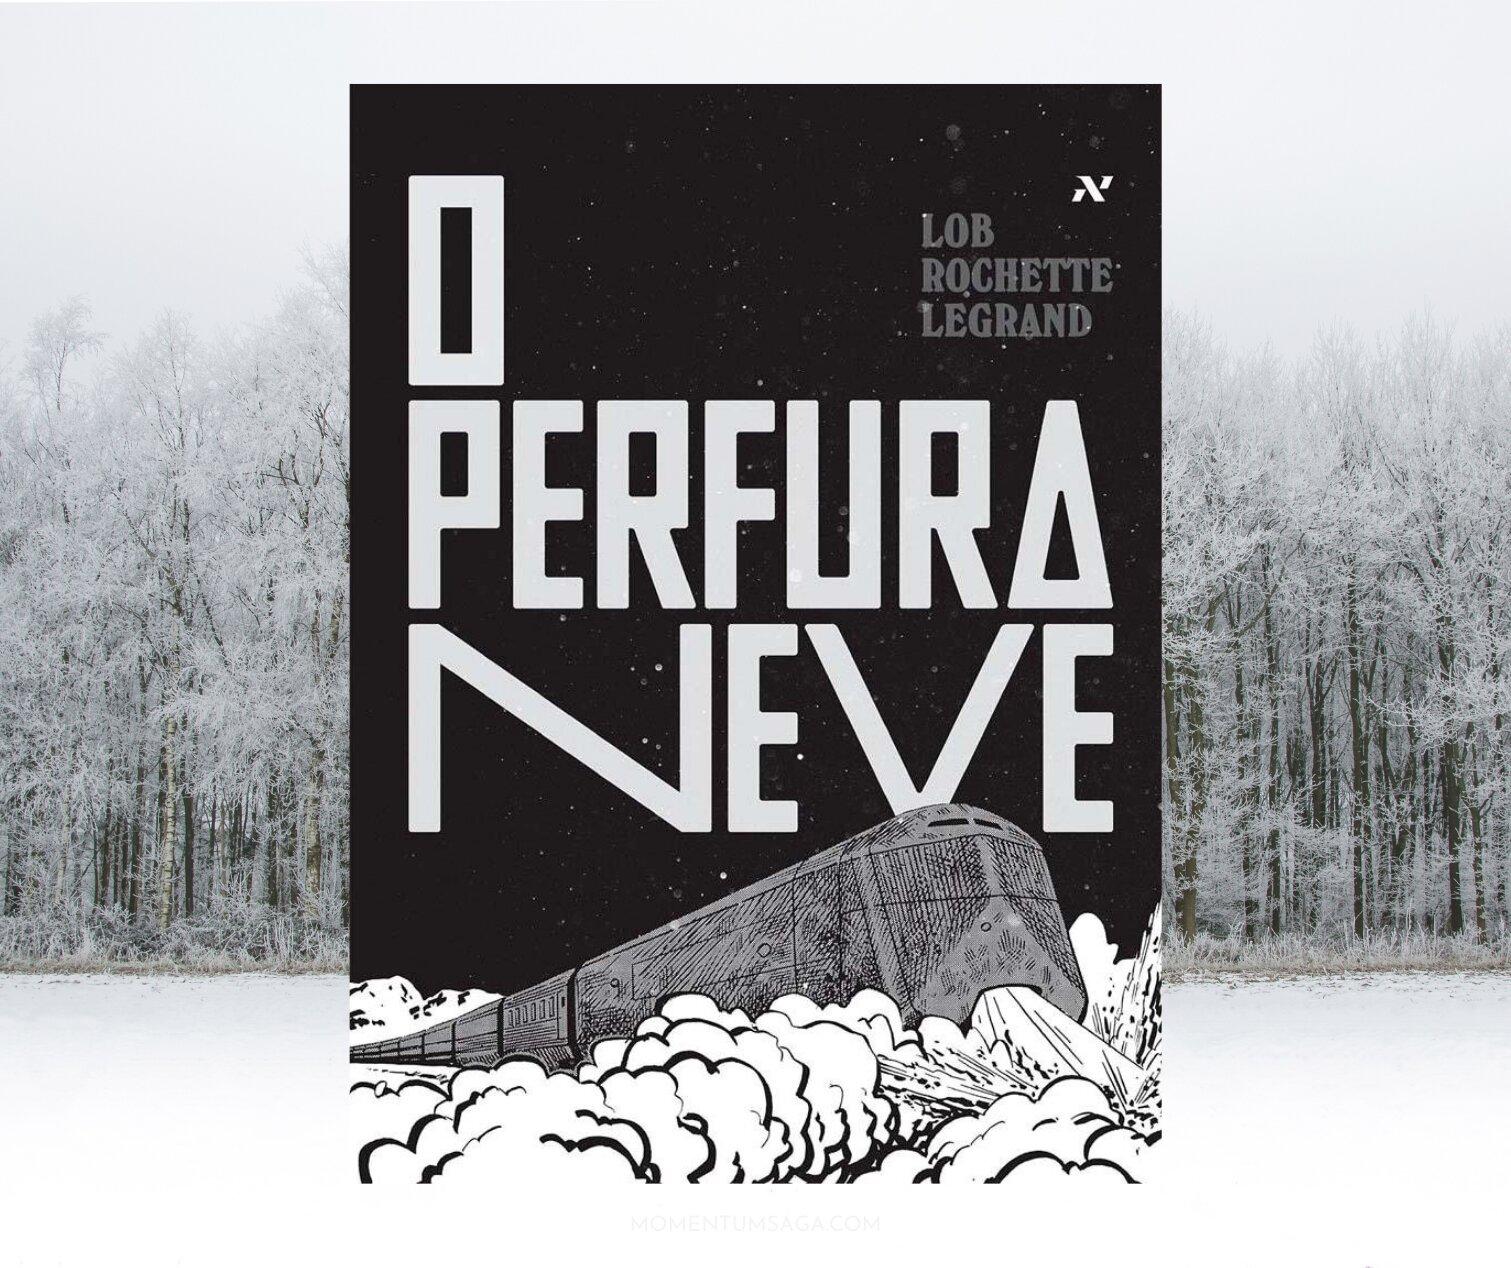 Resenha: O Perfuraneve, de Lob, Rochette e Legrand